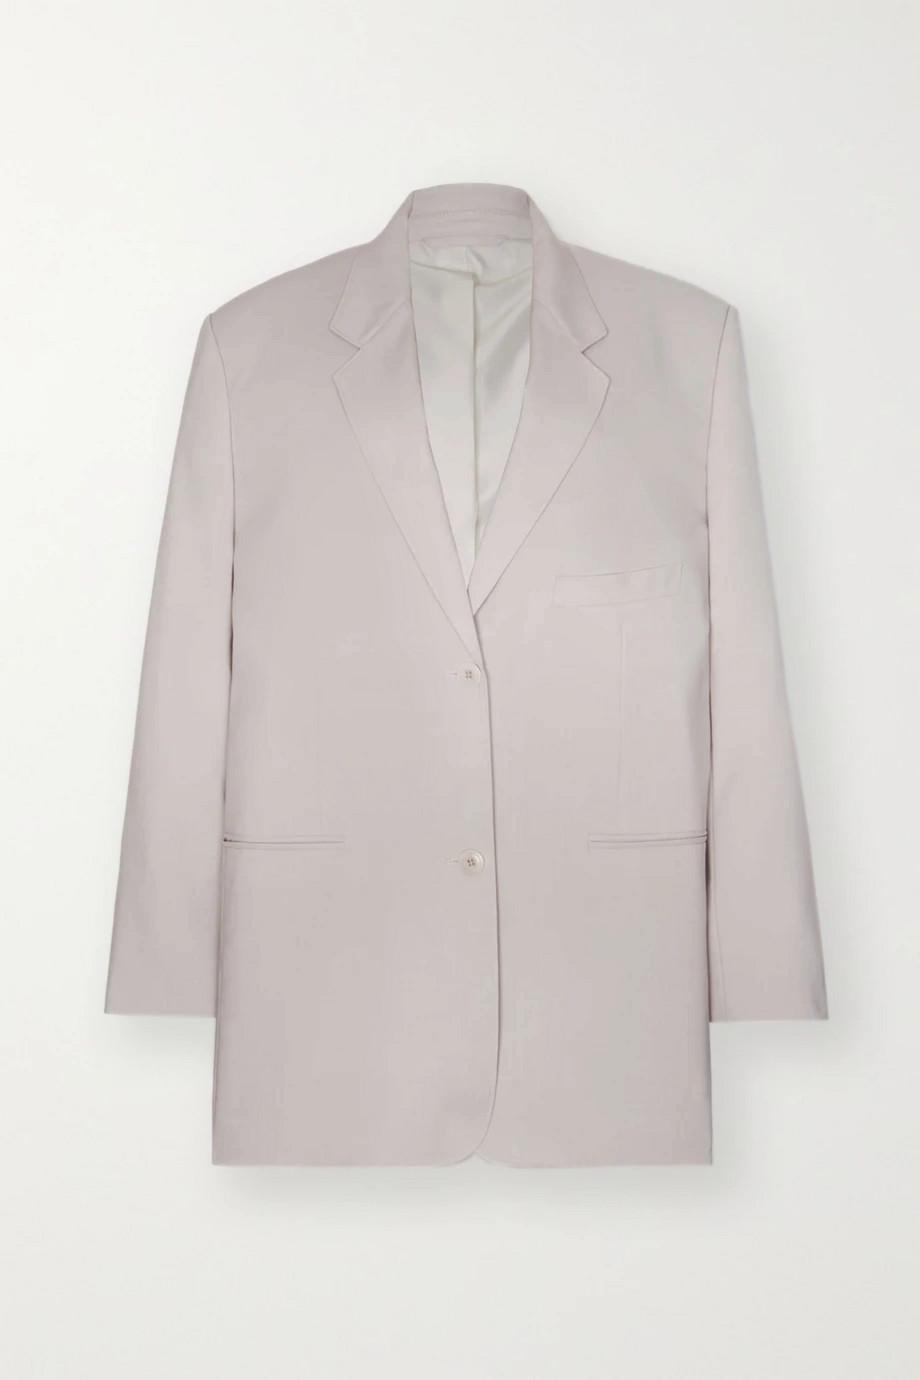 Frankie Shop Pernille oversized woven blazer